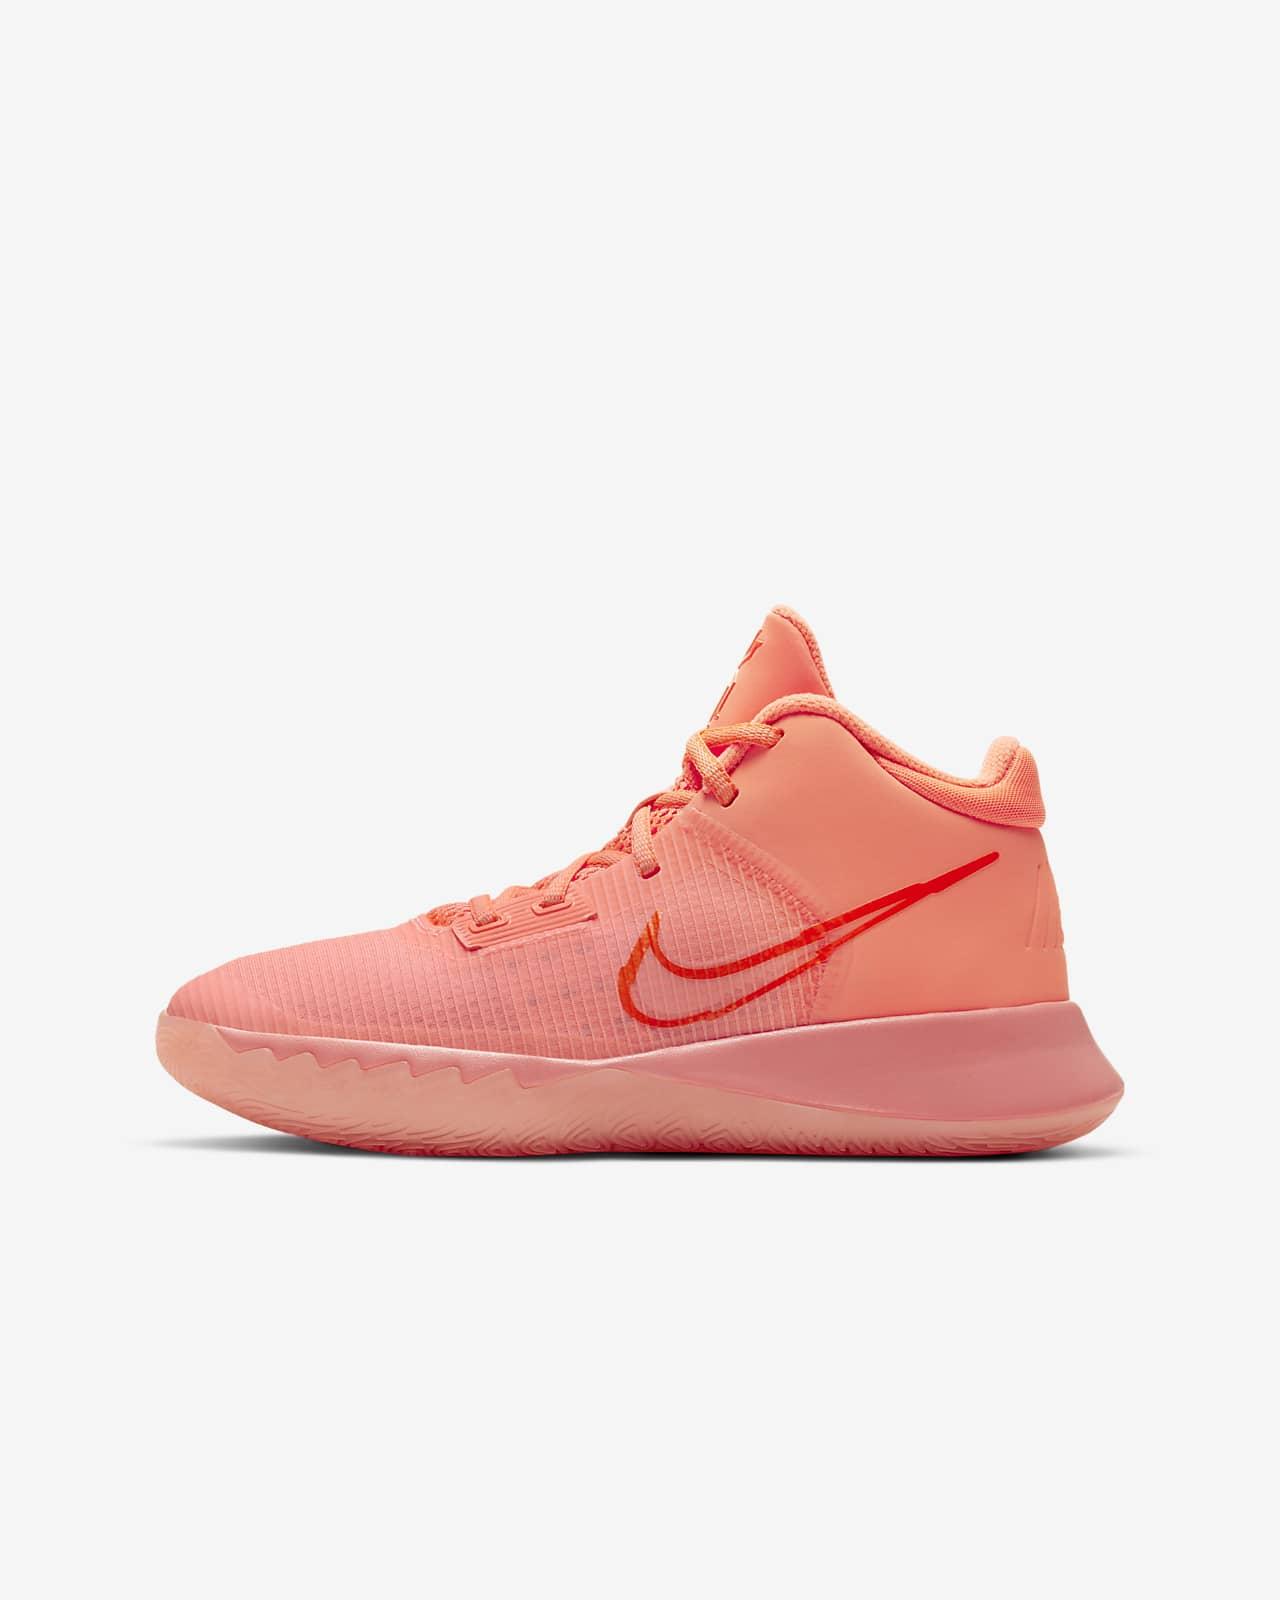 Kyrie Flytrap 4 Big Kids' Basketball Shoe